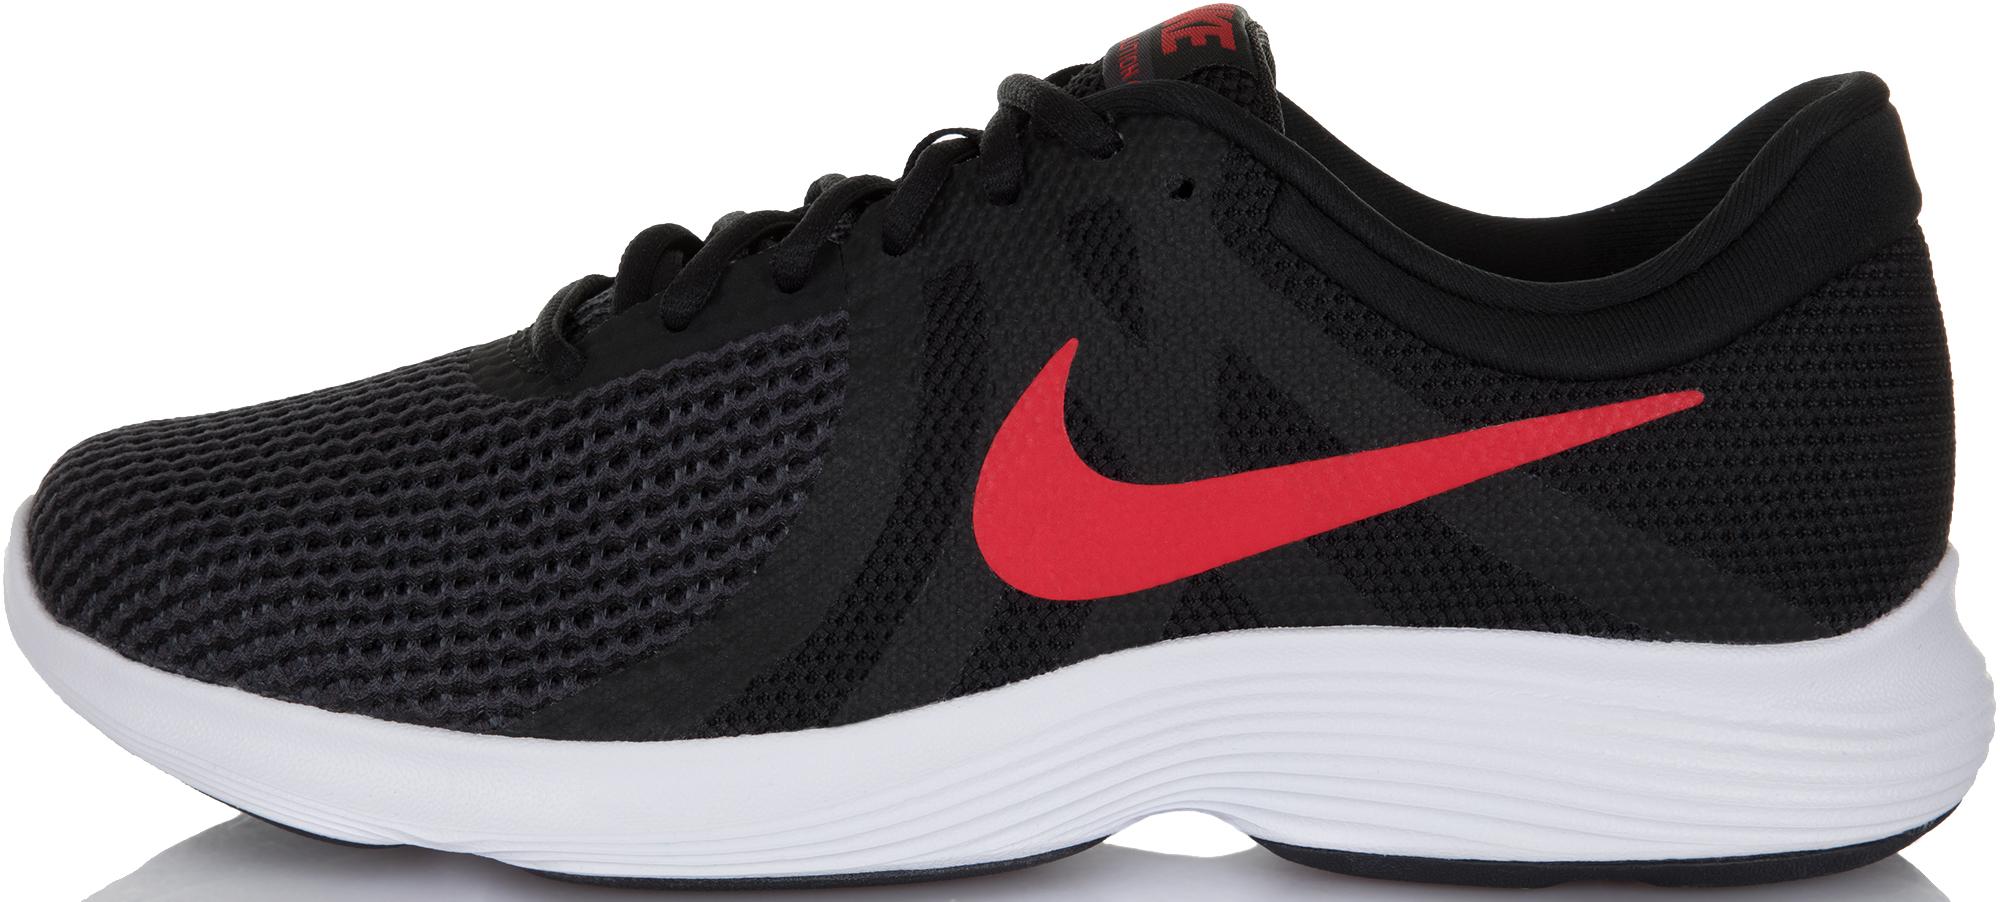 Nike Кроссовки мужские Nike Revolution 4, размер 45 кроссовки jordan мужские кроссовки flight origin 4 921196 004 8